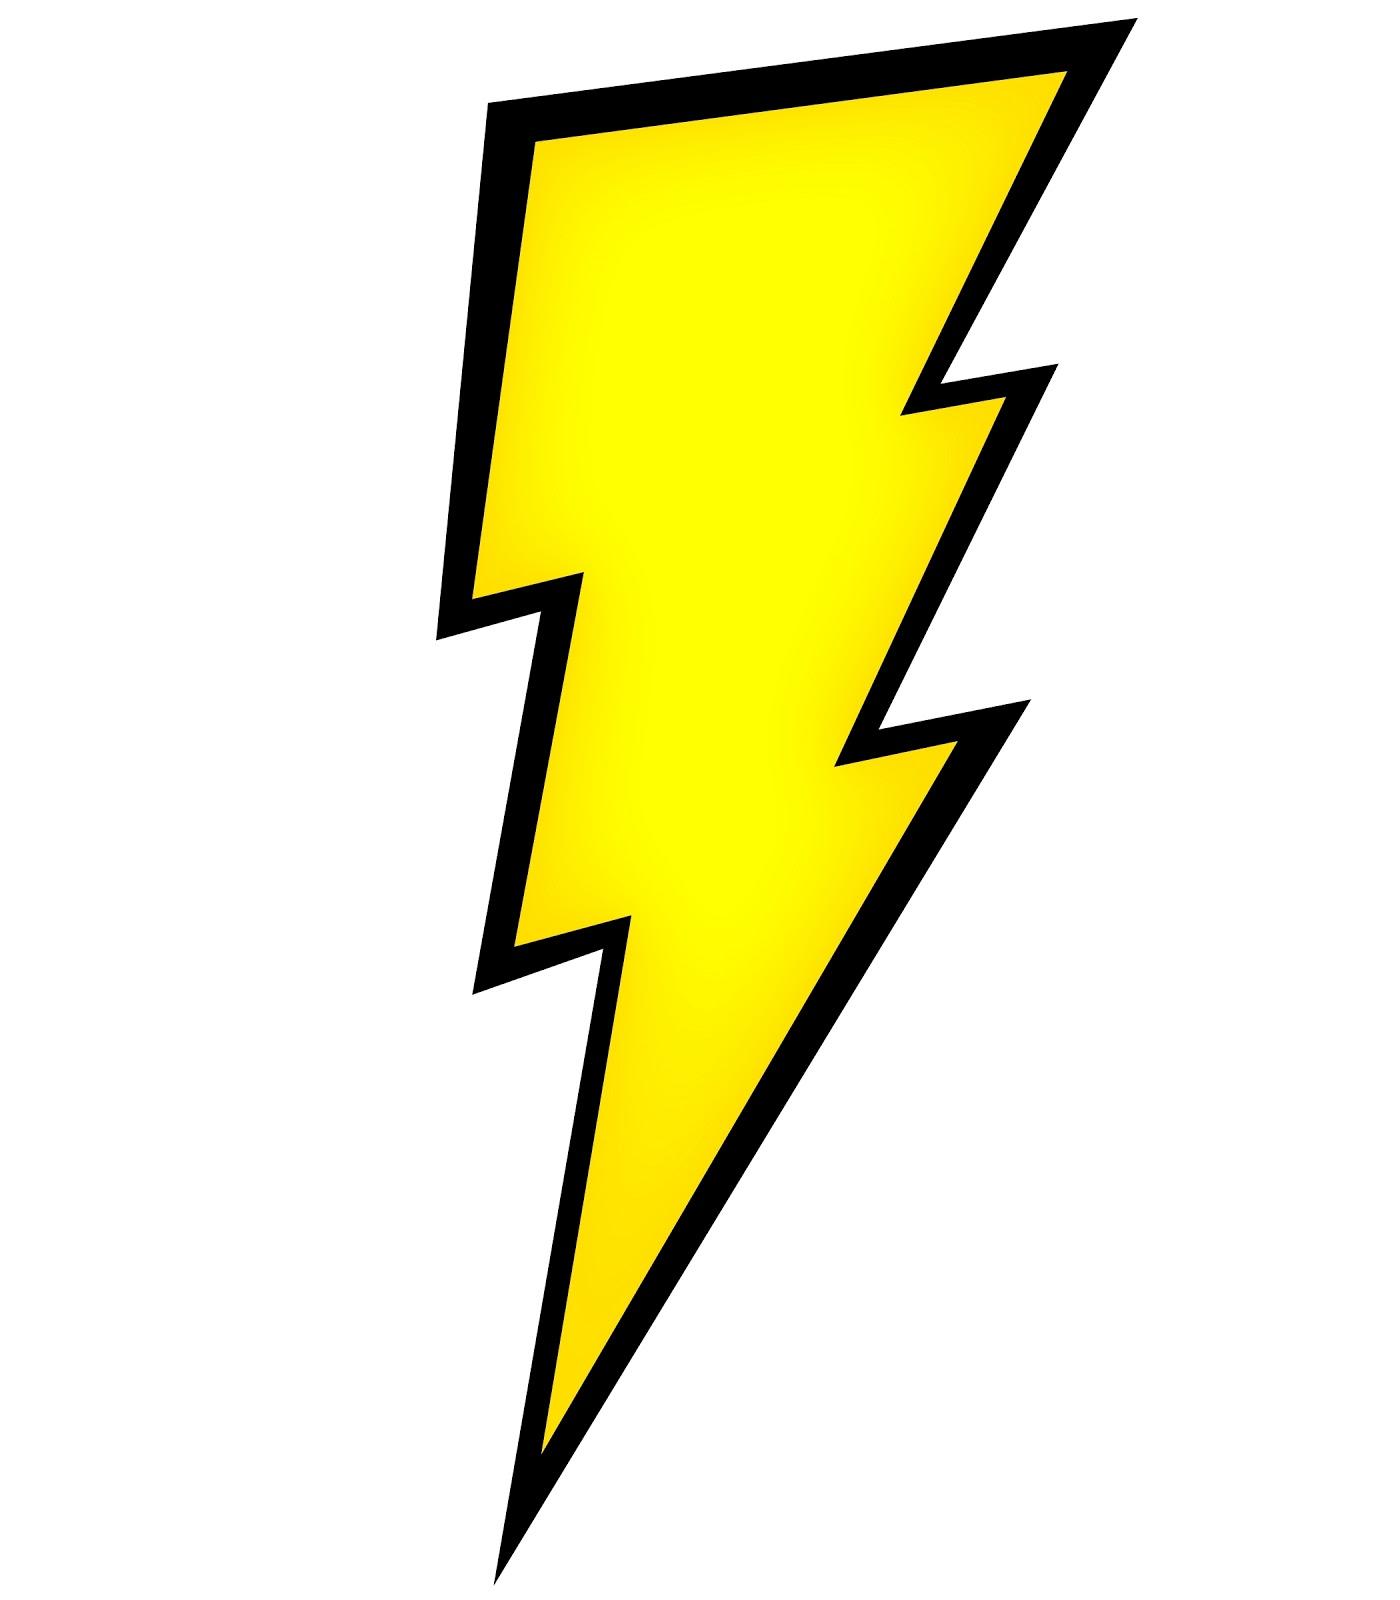 picture transparent download Free lightning bolt pictures. Lighting clipart.